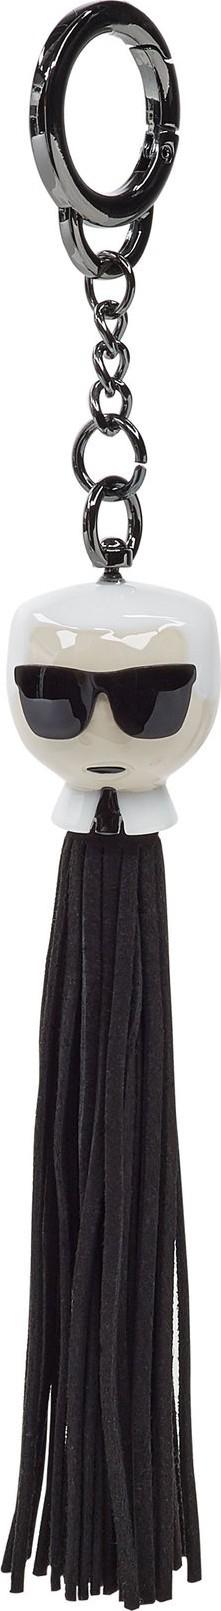 Karl Lagerfeld Karl Tassel Keychain